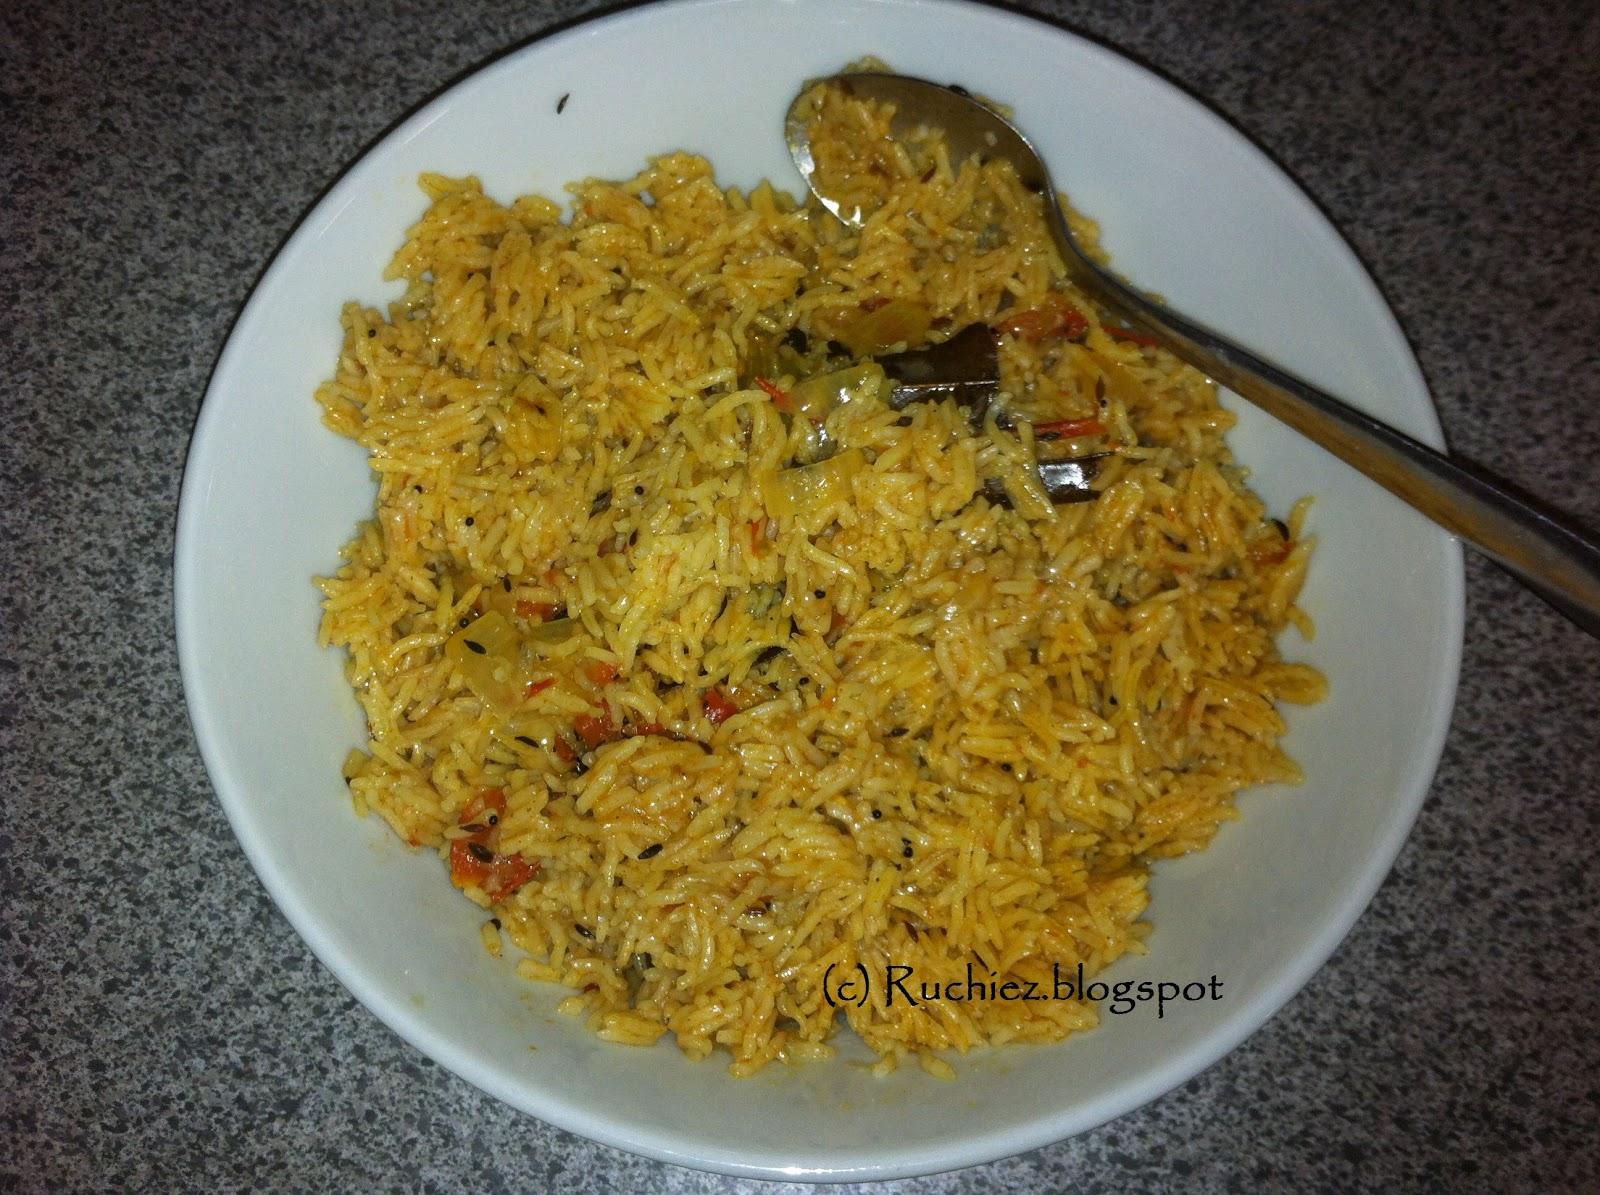 Ruchiezs spicy tomato rice kannada spicy tomato rice kannada language tamil language ccuart Choice Image